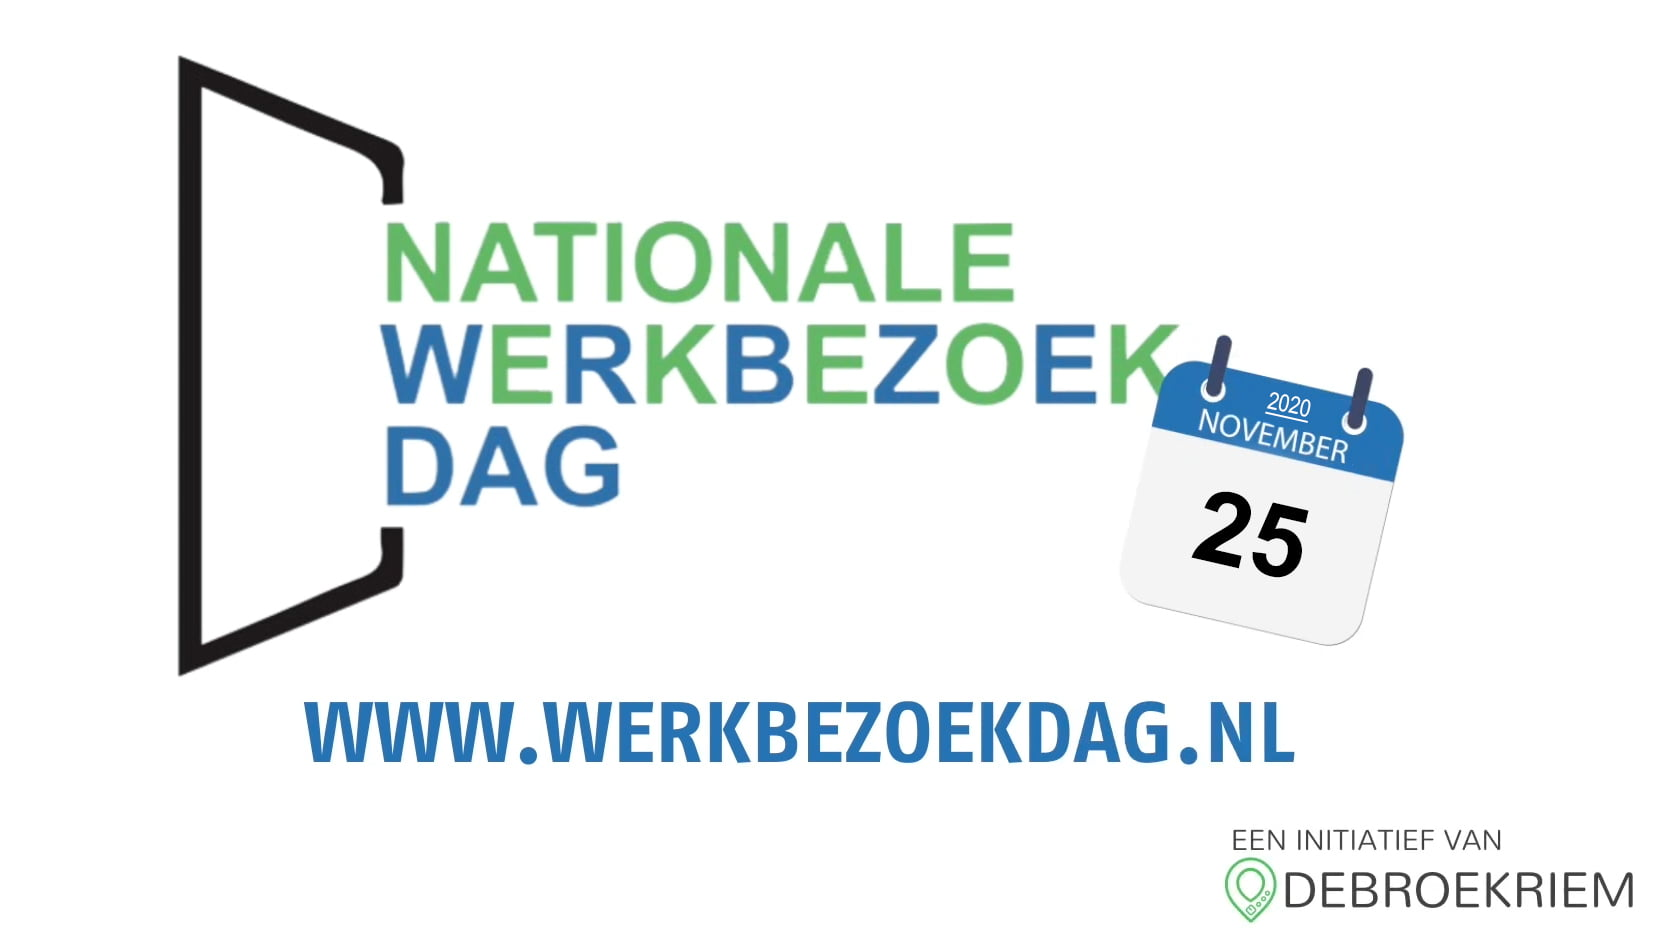 Nationale Werkbezoekdag